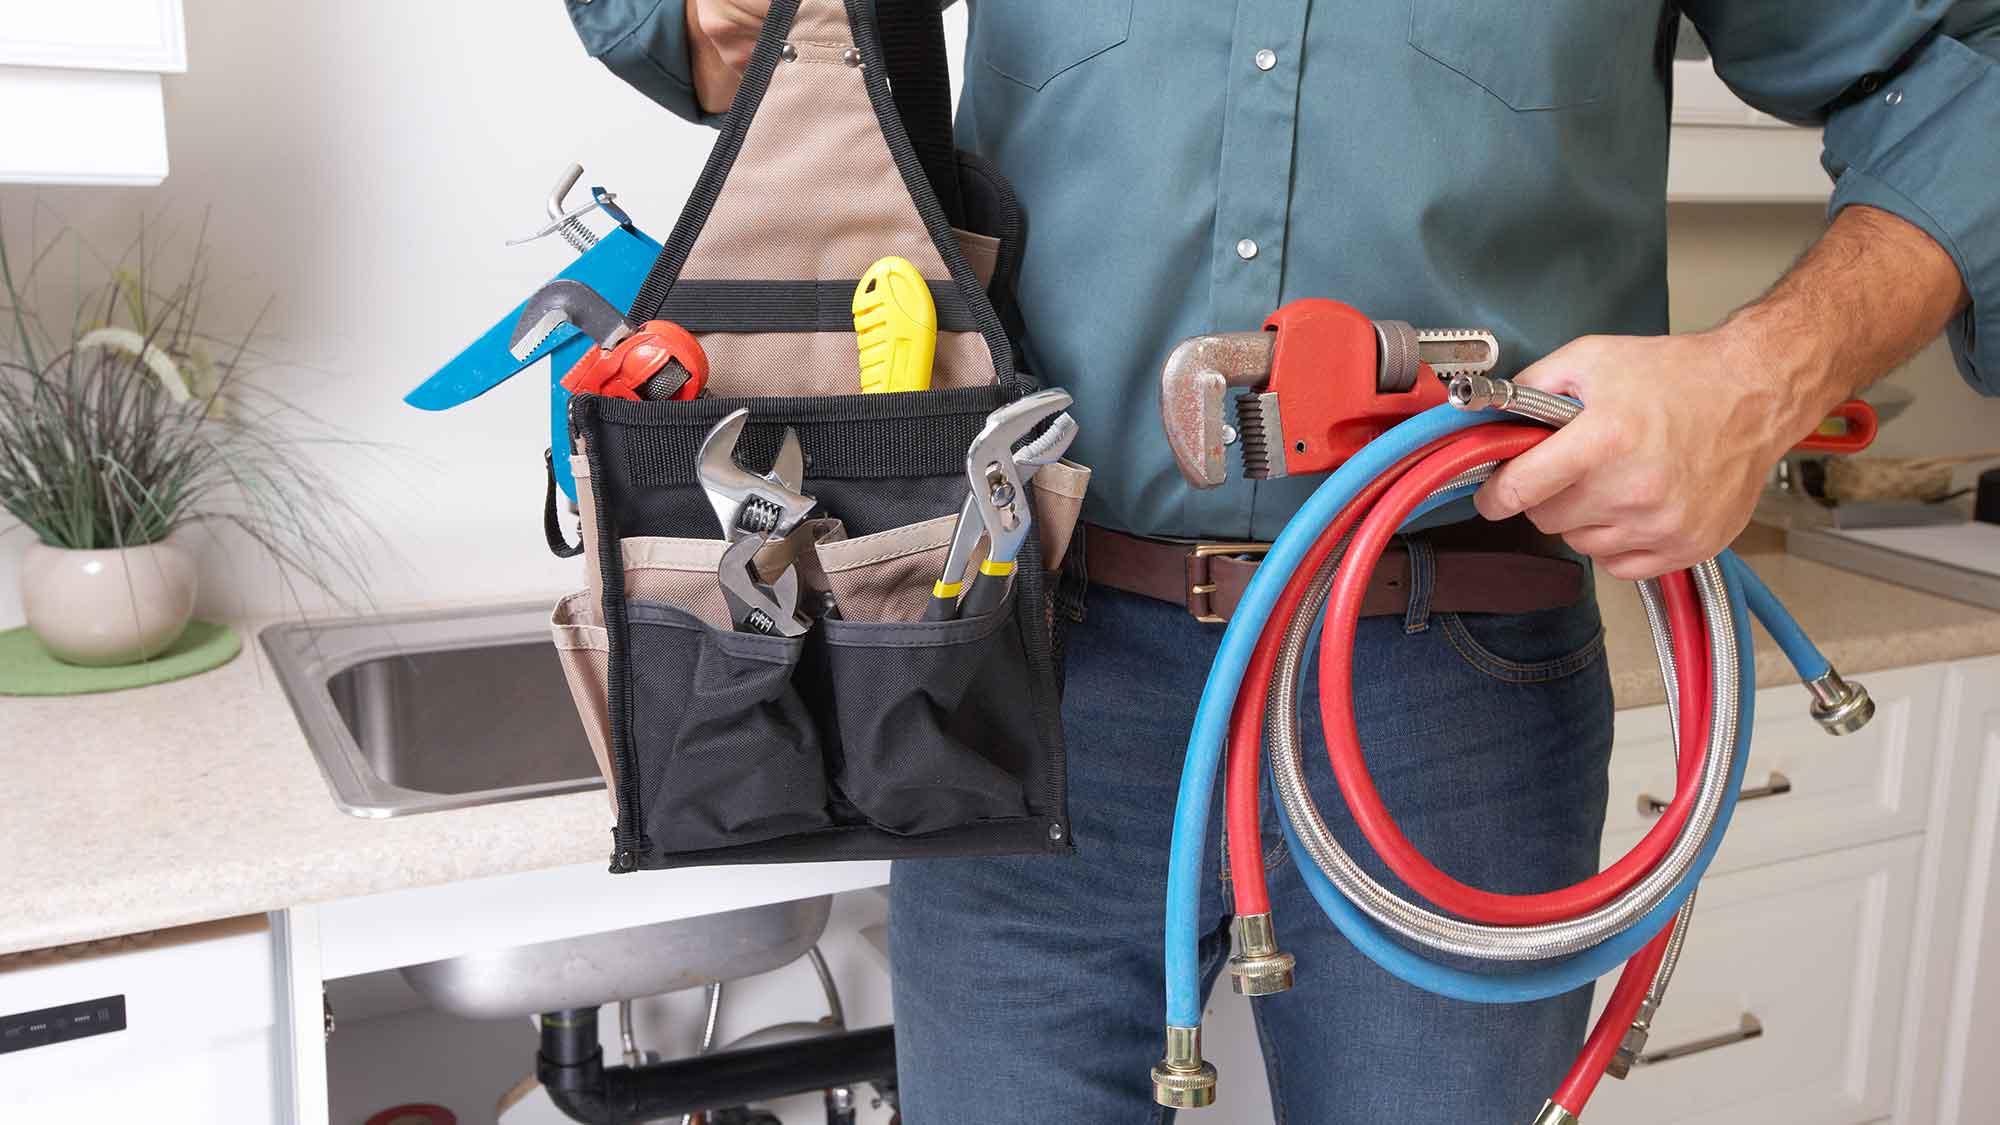 water heater repair essex maintenance leigh on sea pipes